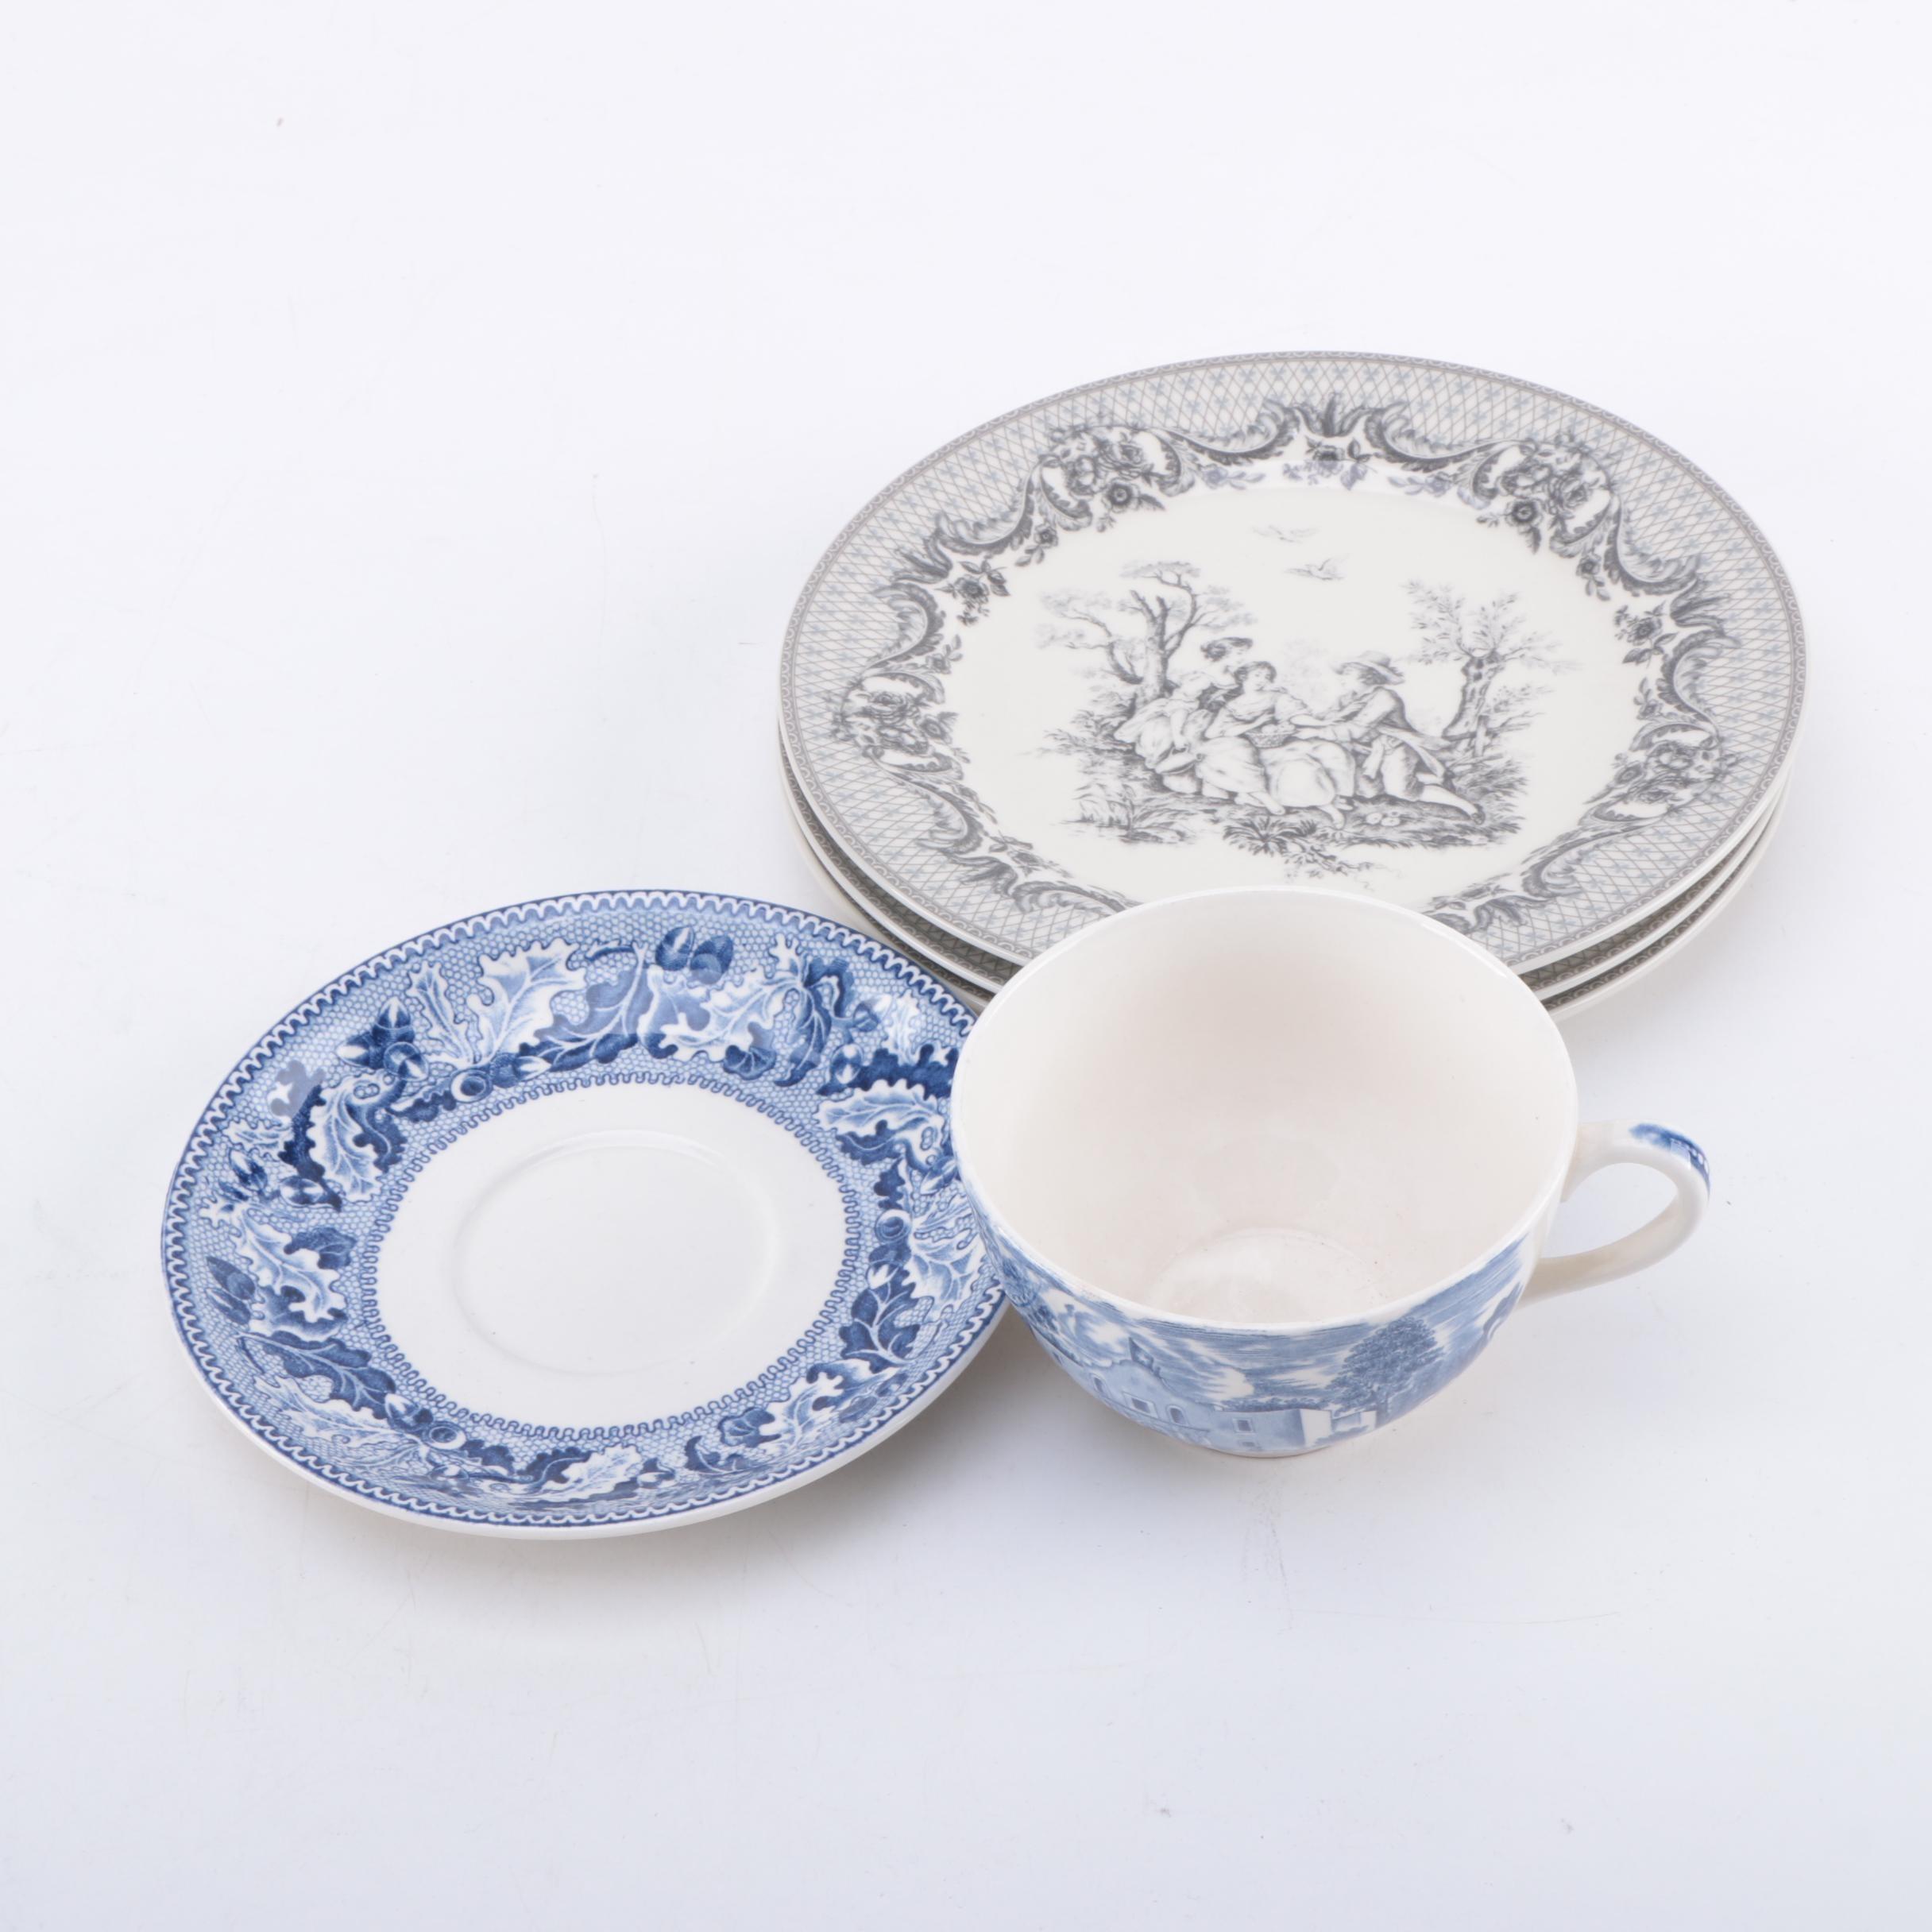 Vintage Tableware Including Johnson Brothers and Godinger